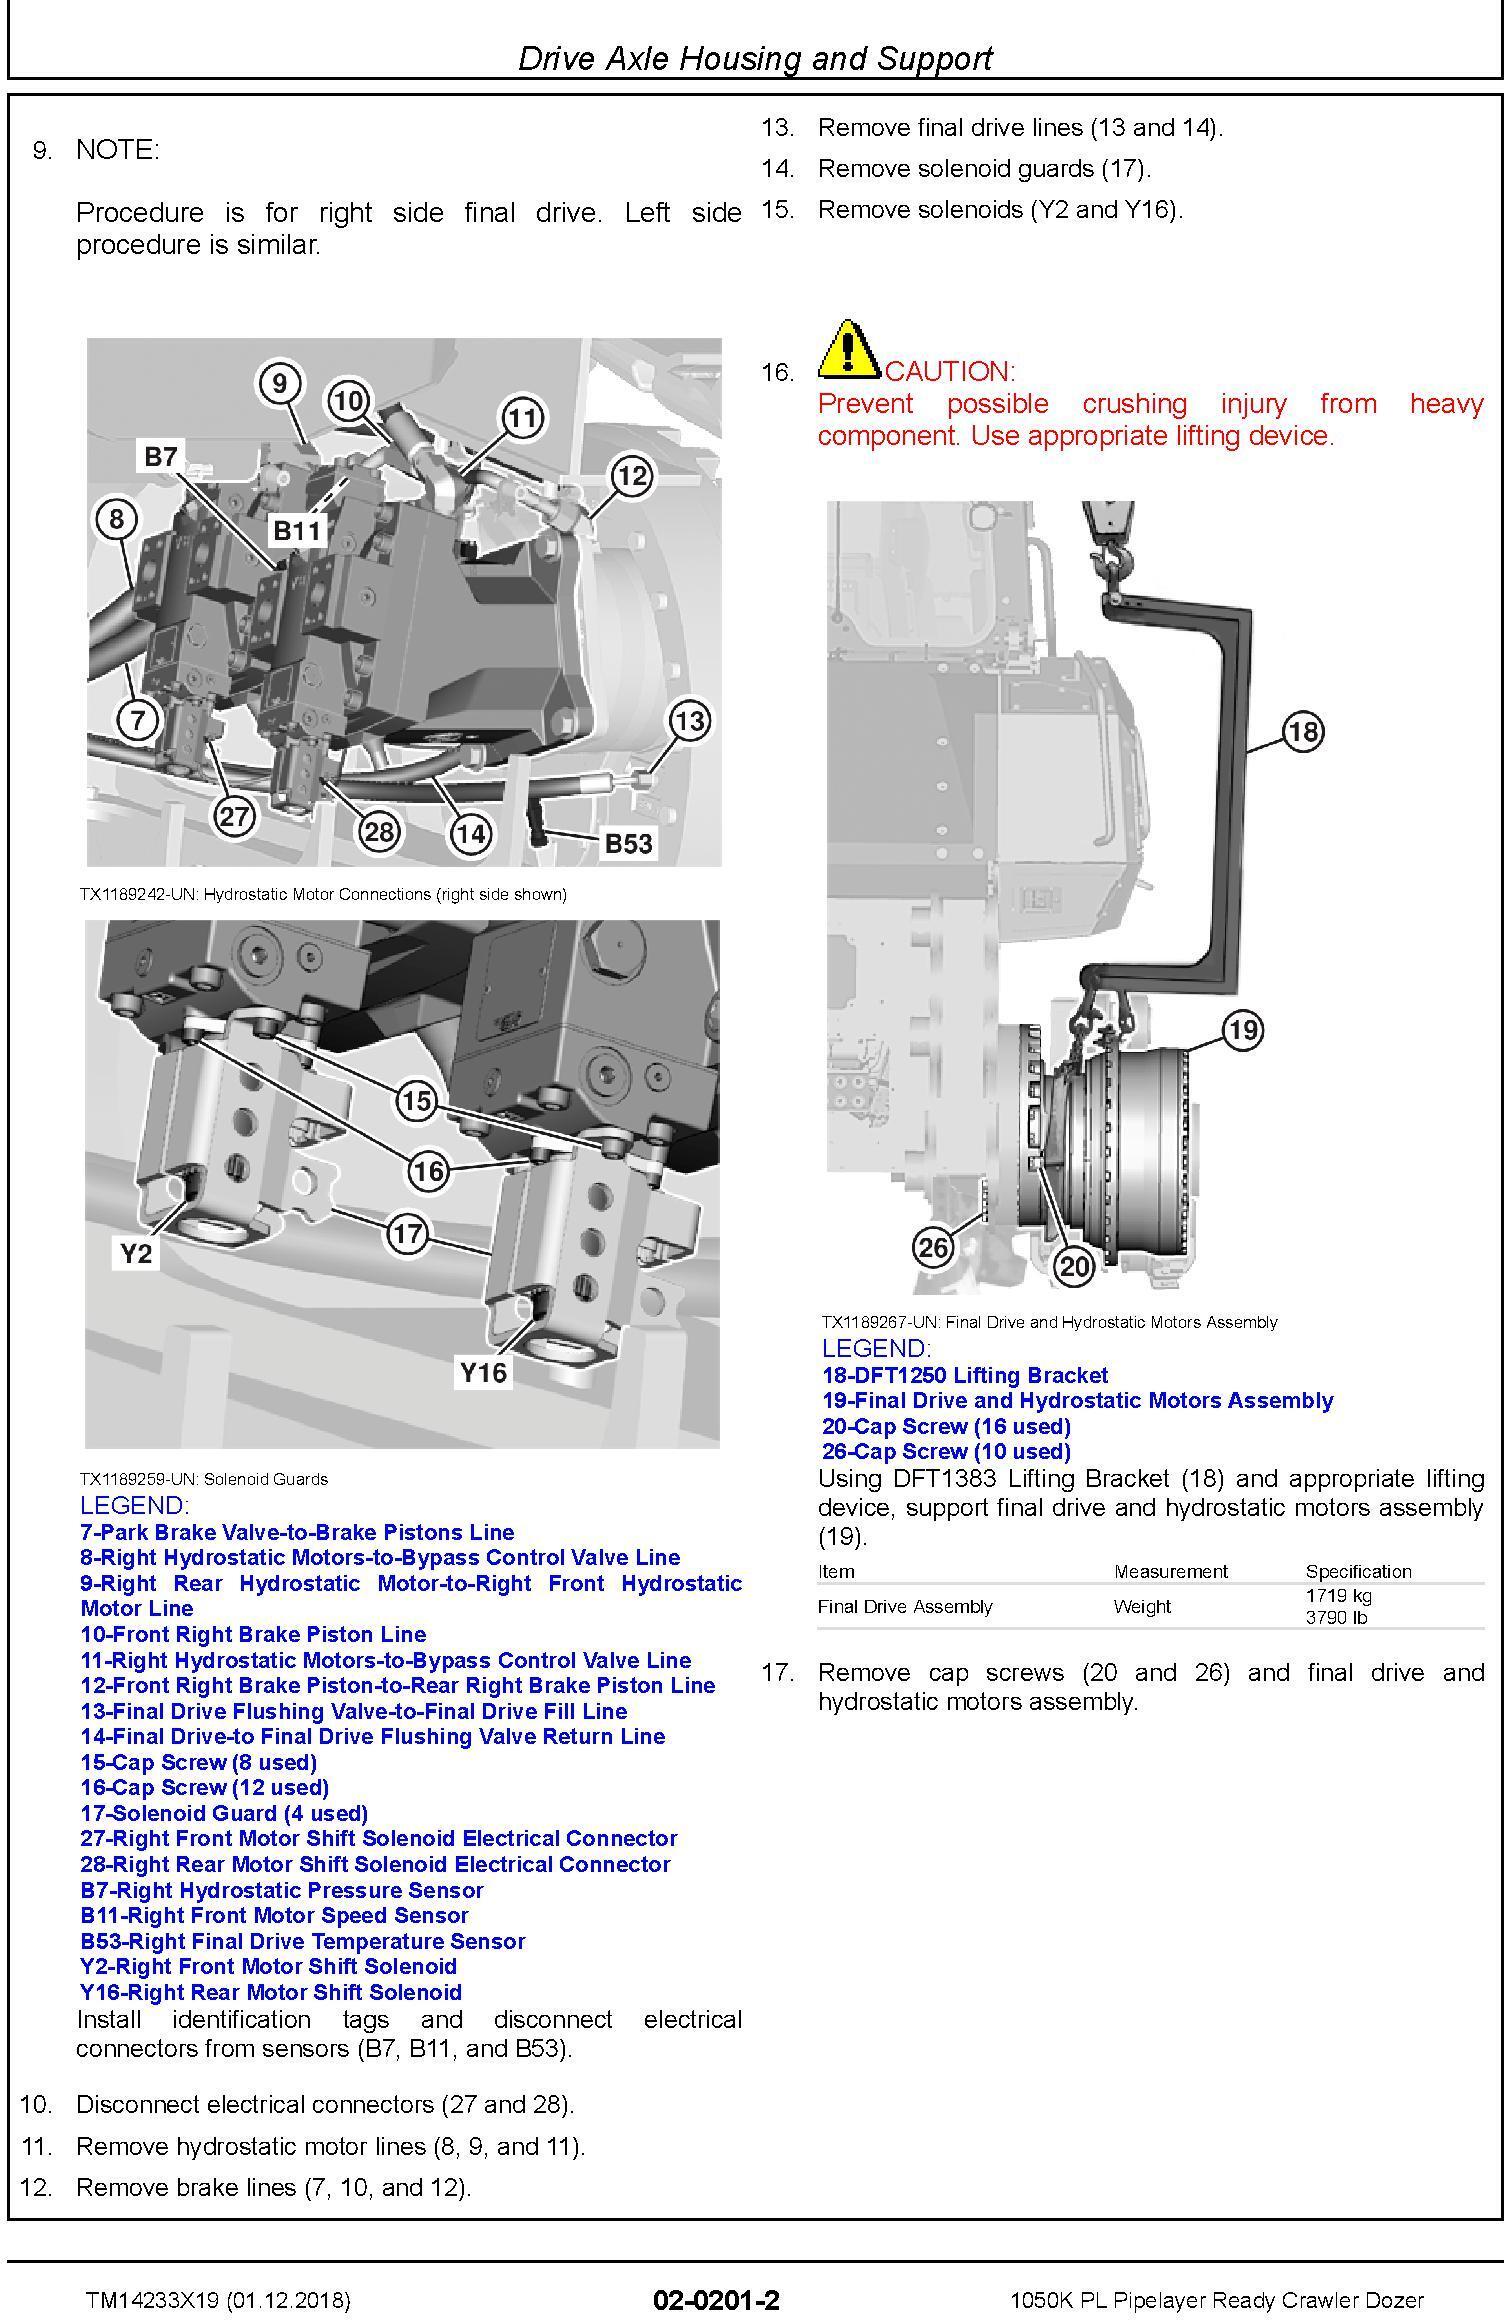 John Deere 1050K PL (SN. F310922-318801) Pipelayer Ready Crawler Dozer Repair Manual (TM14233X19) - 3